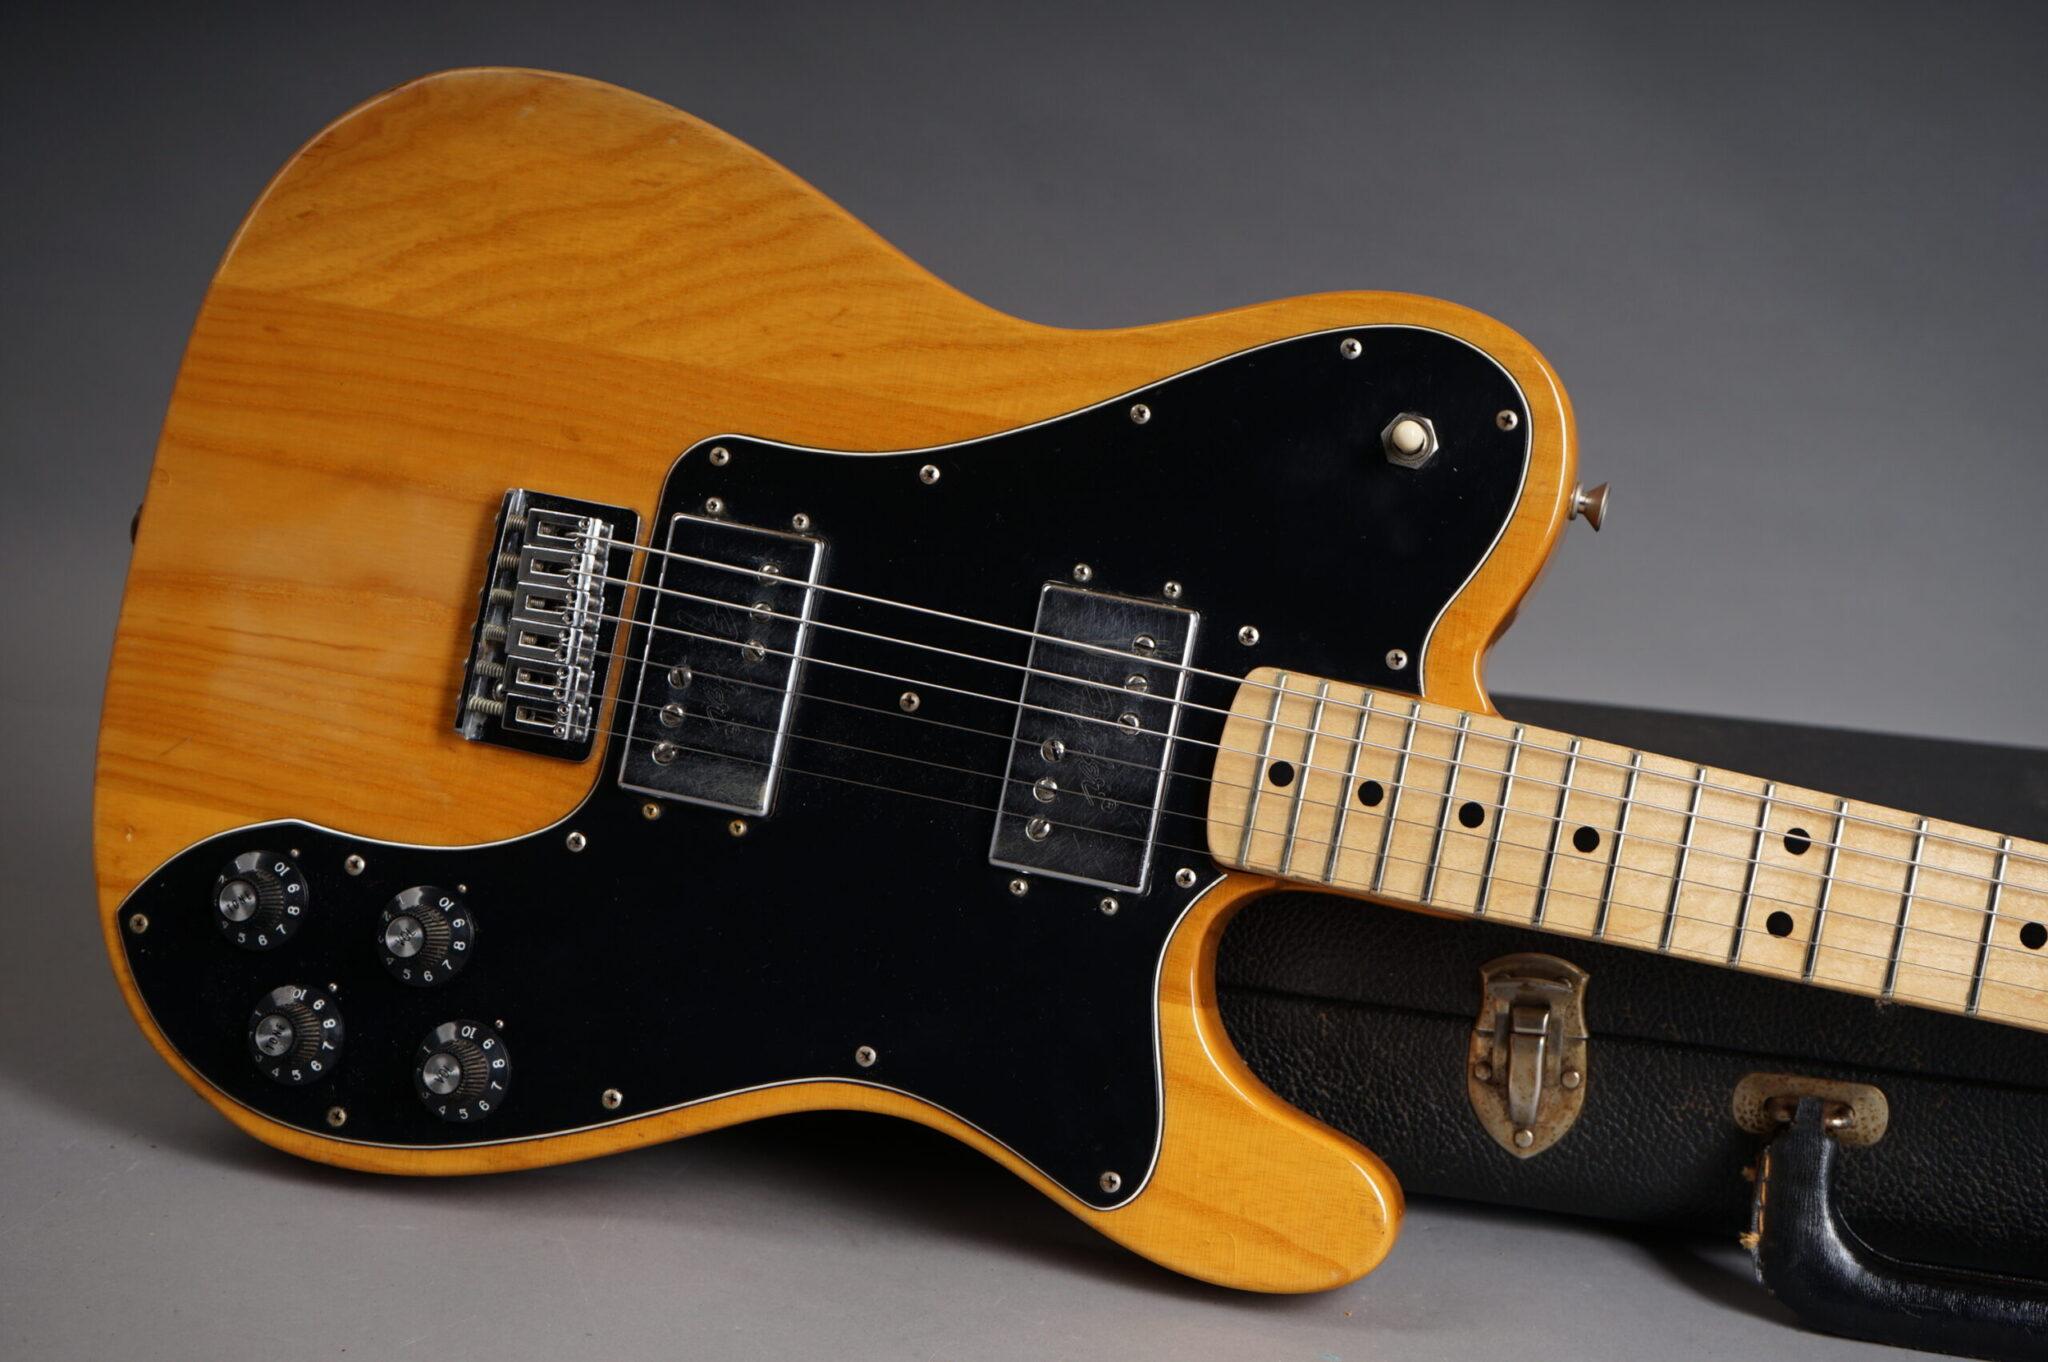 https://guitarpoint.de/app/uploads/products/1973-fender-telecaster-deluxe-natural/1973-Fender-Telecaster-Deluxe-Natural-418365-0-scaled-2048x1362.jpg